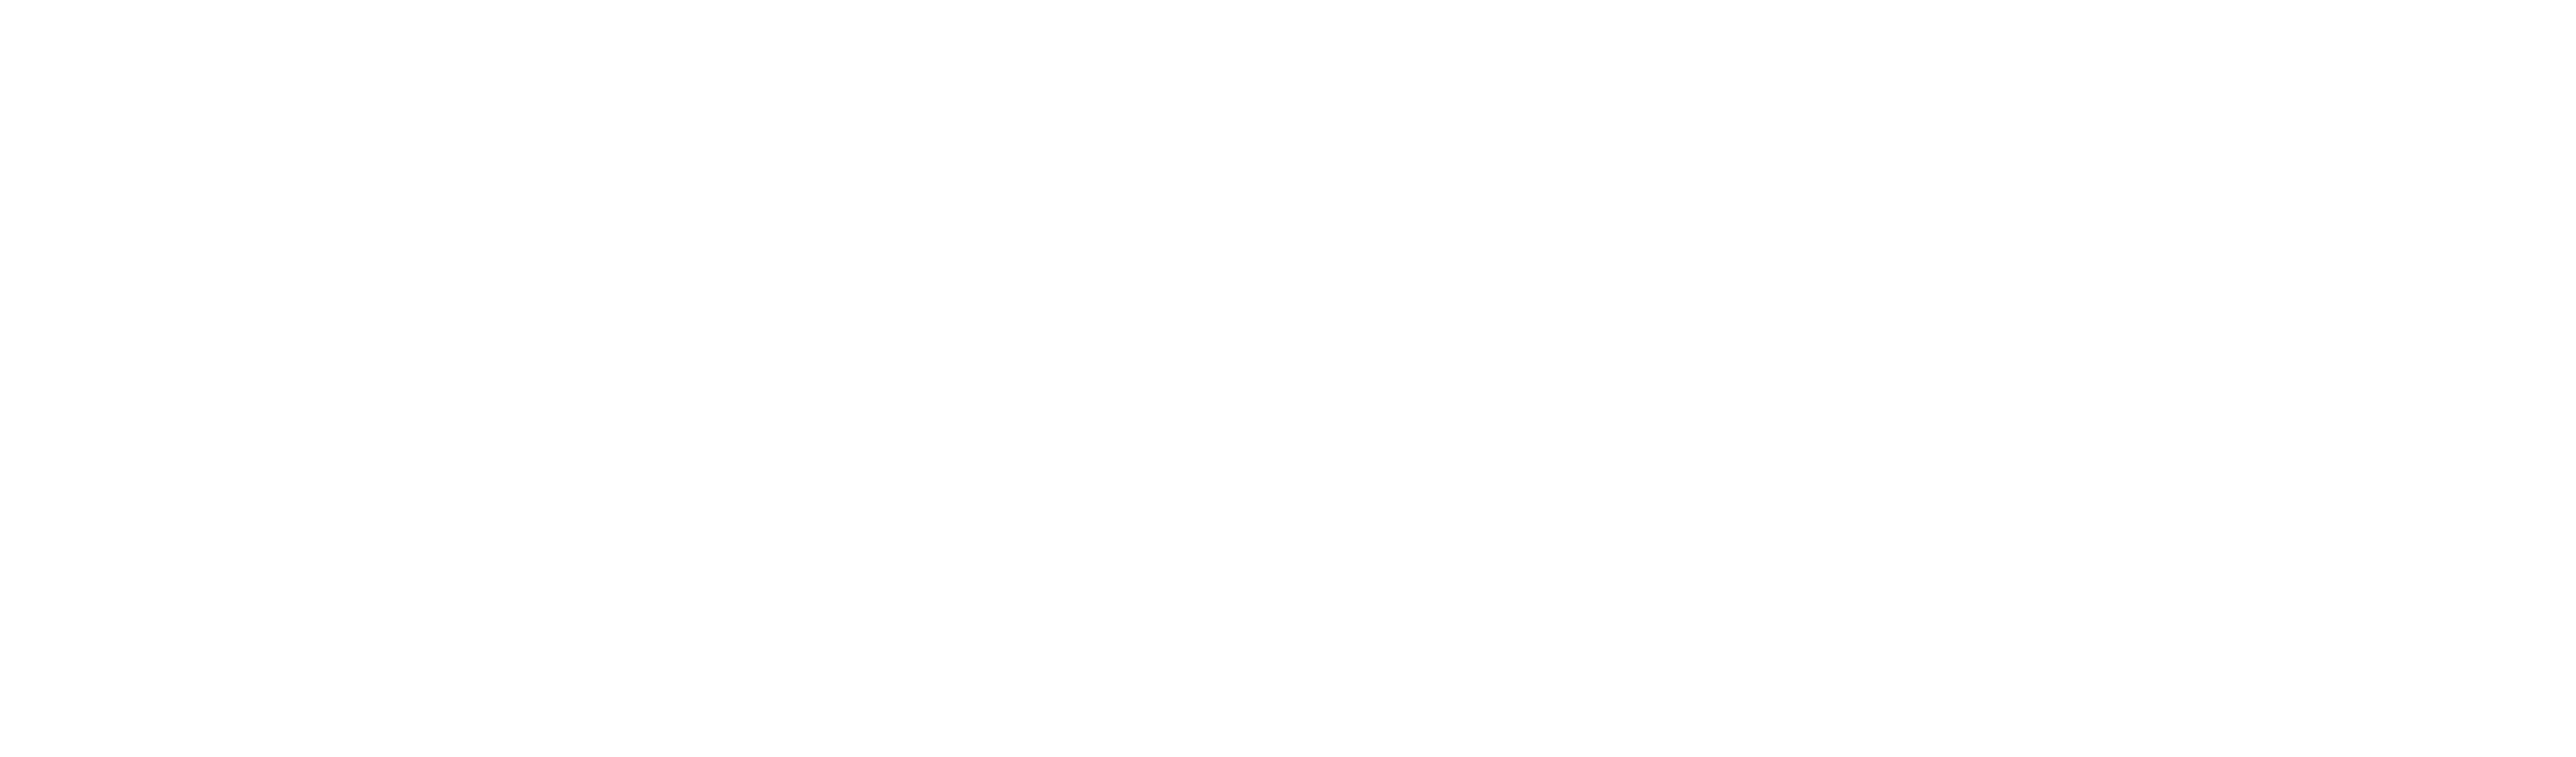 AVID 3 - White